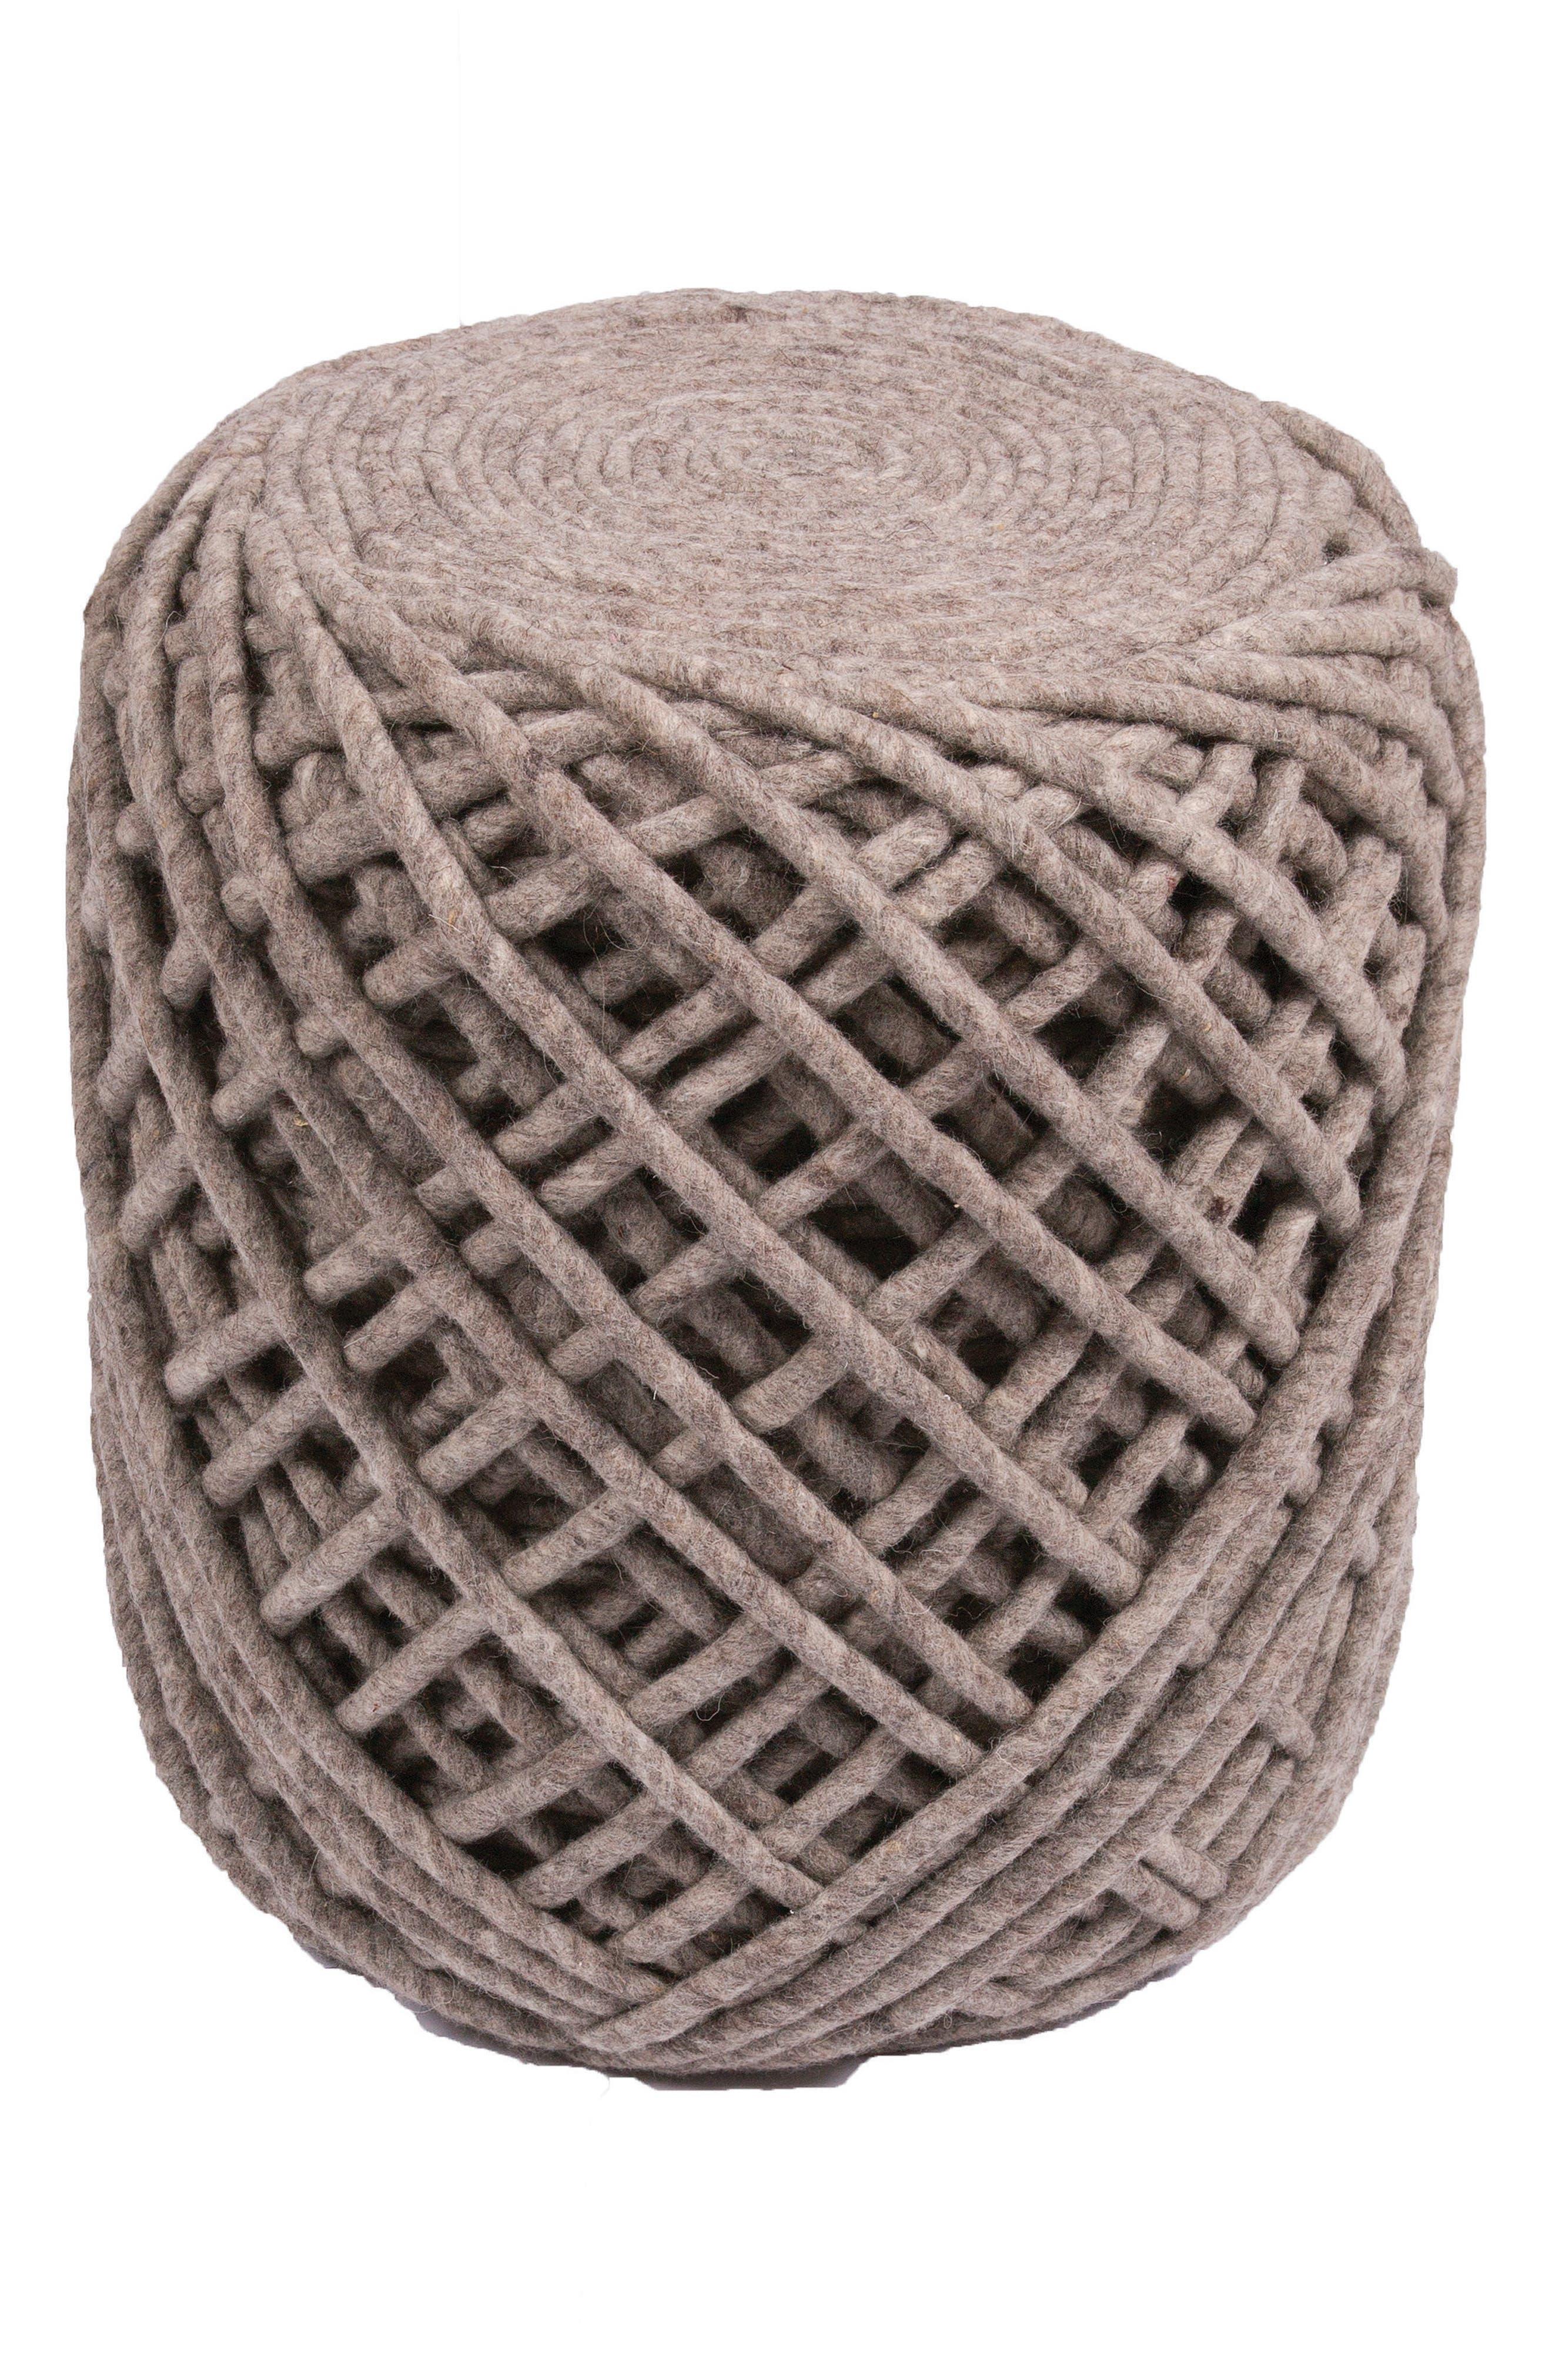 Guna Ash Wool Pouf,                         Main,                         color, Grey